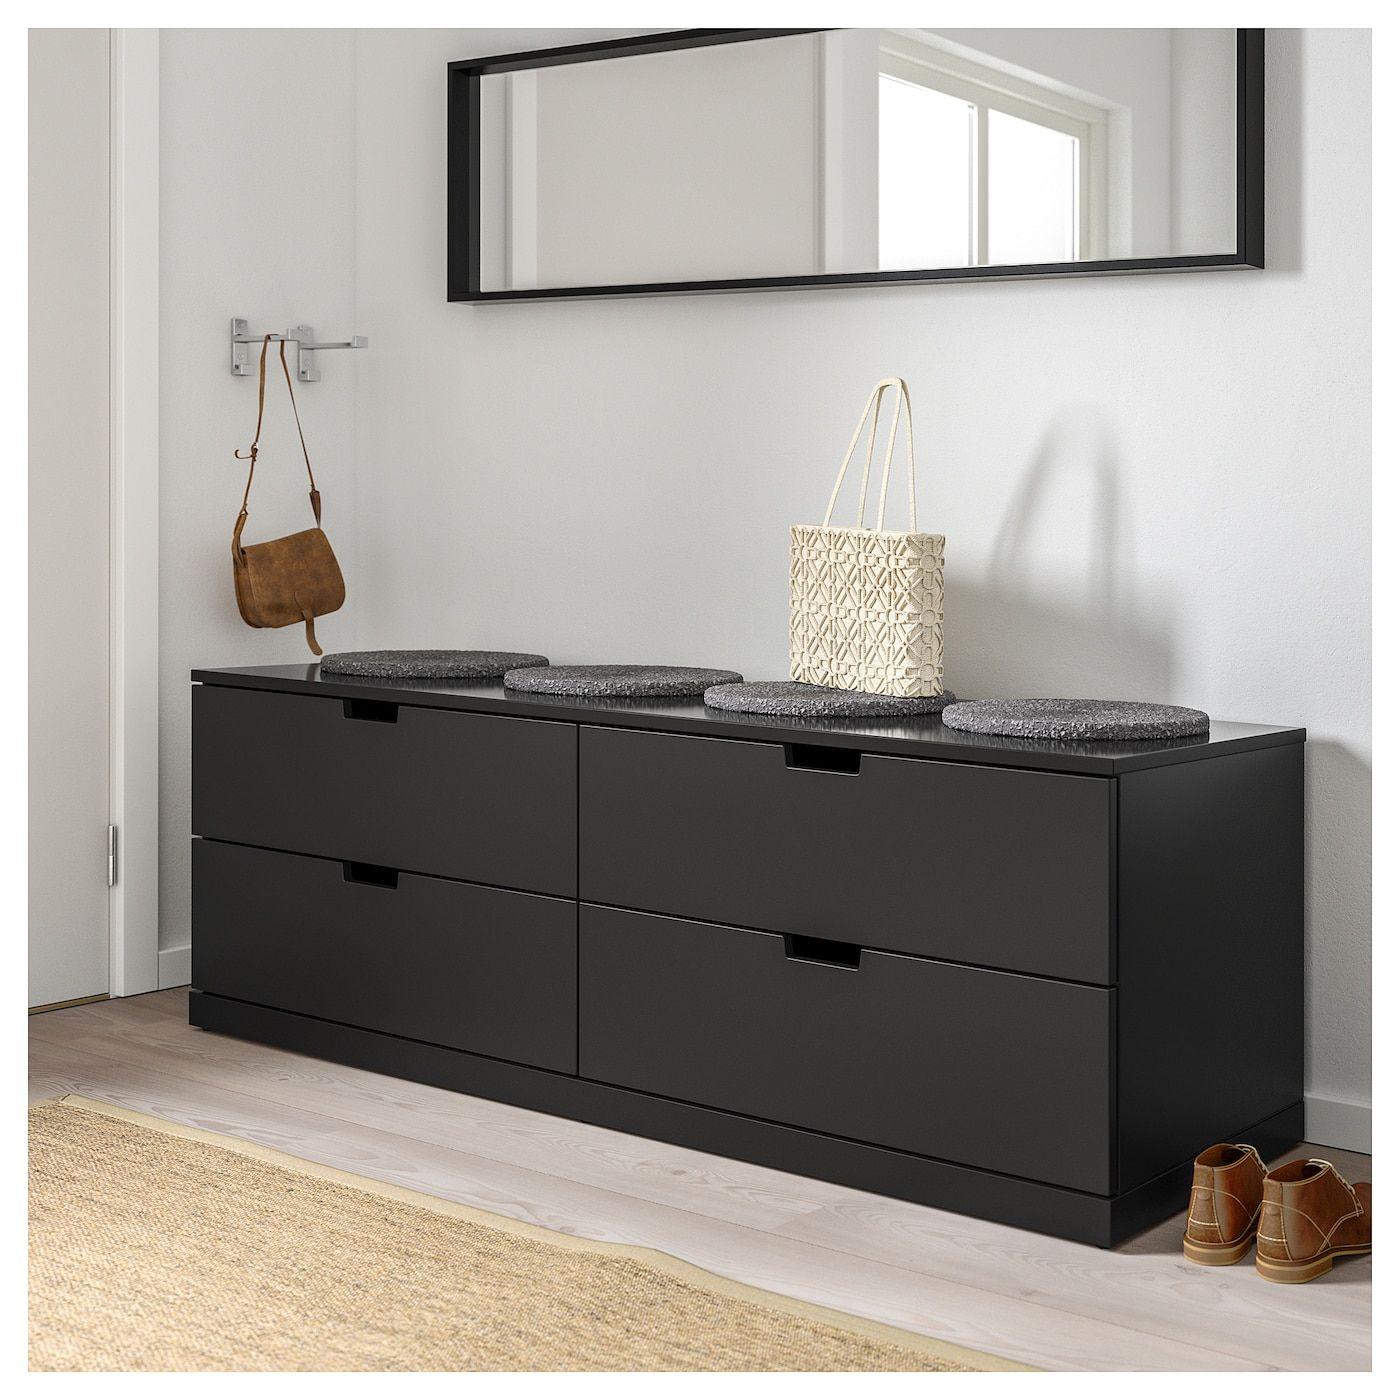 Nordli Ladekast Met 4 Lades Antraciet 160x54 Cm Ikea Ikea Nordli Bedroom Storage For Small Rooms 4 Drawer Dresser